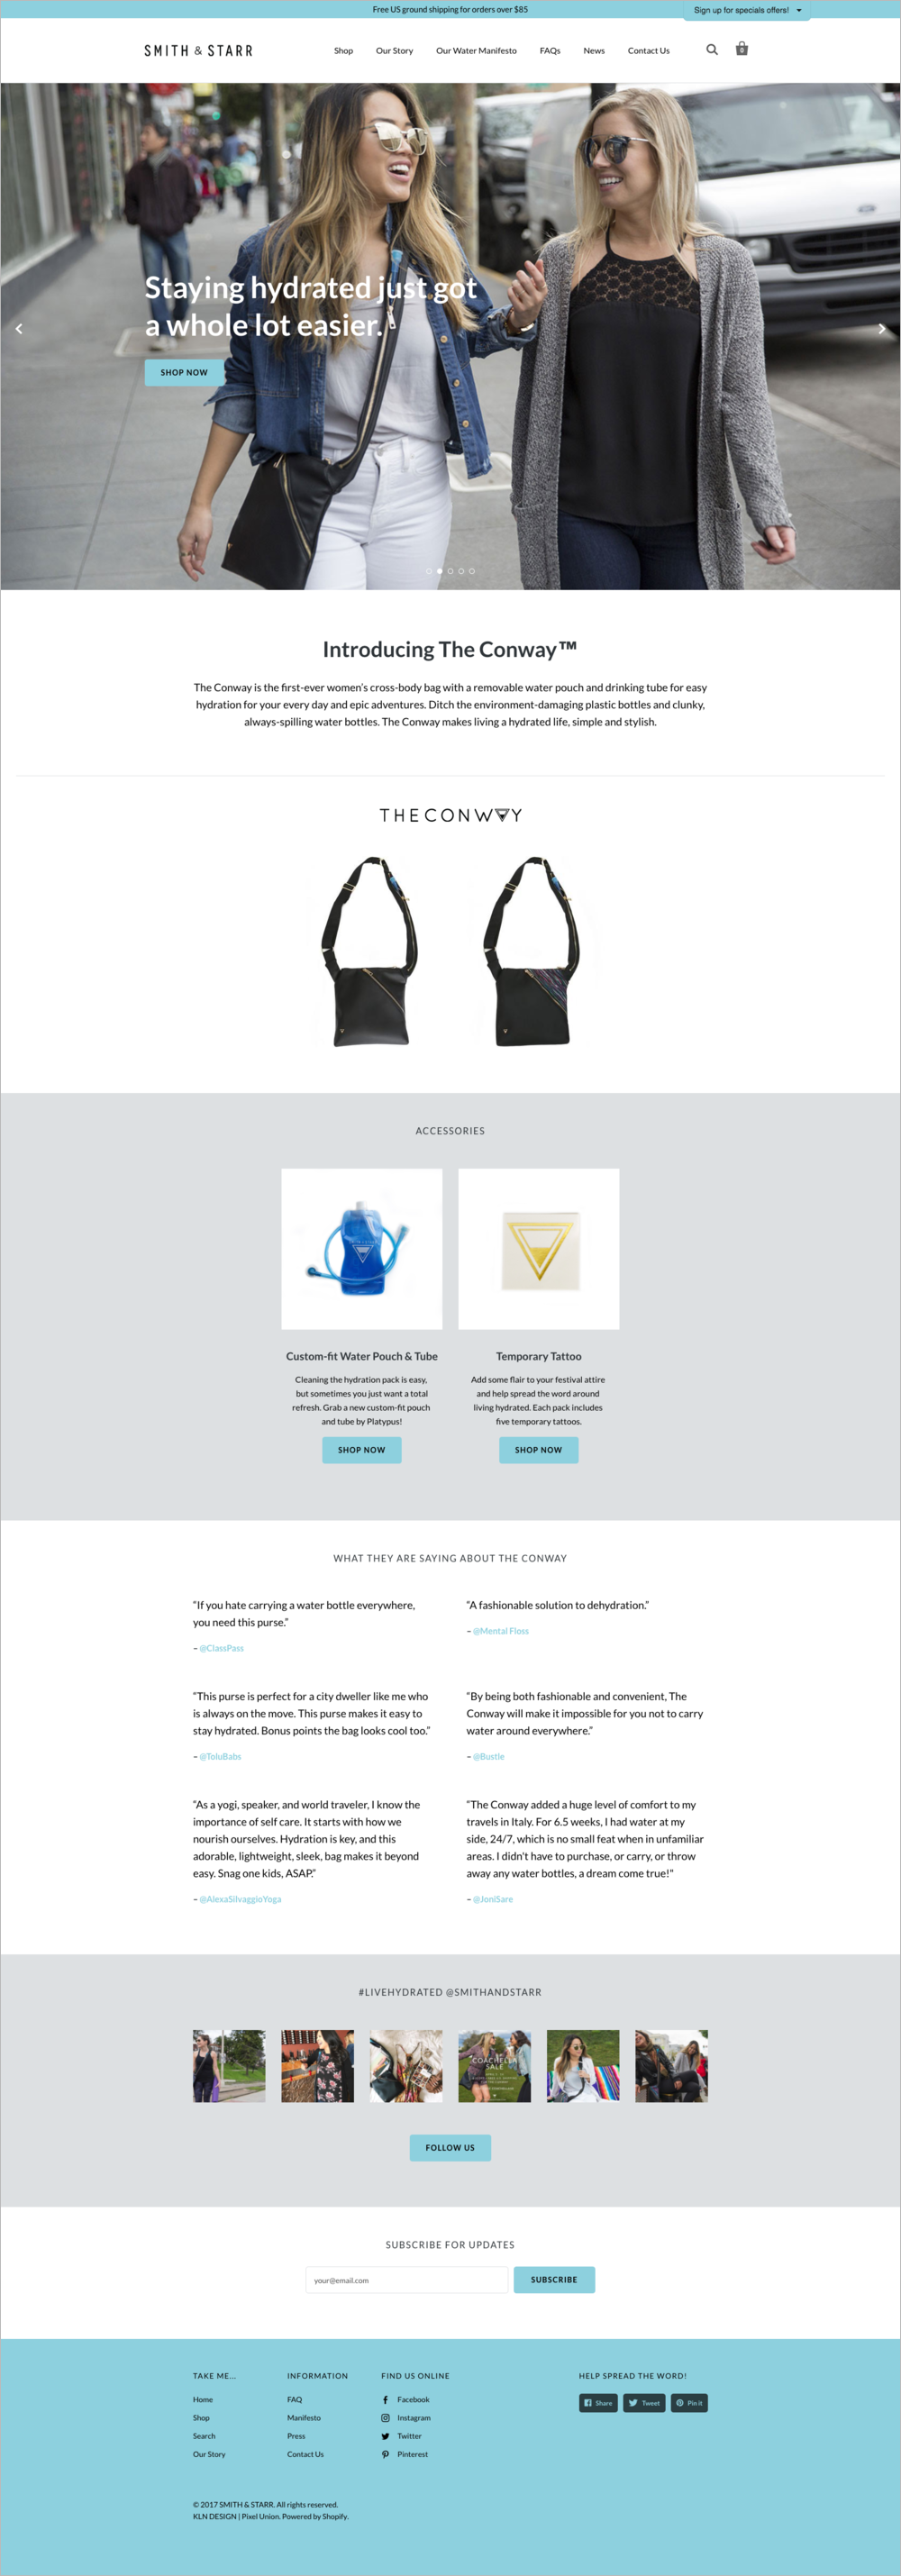 Smith & Starr Homepage Design - KLN Design